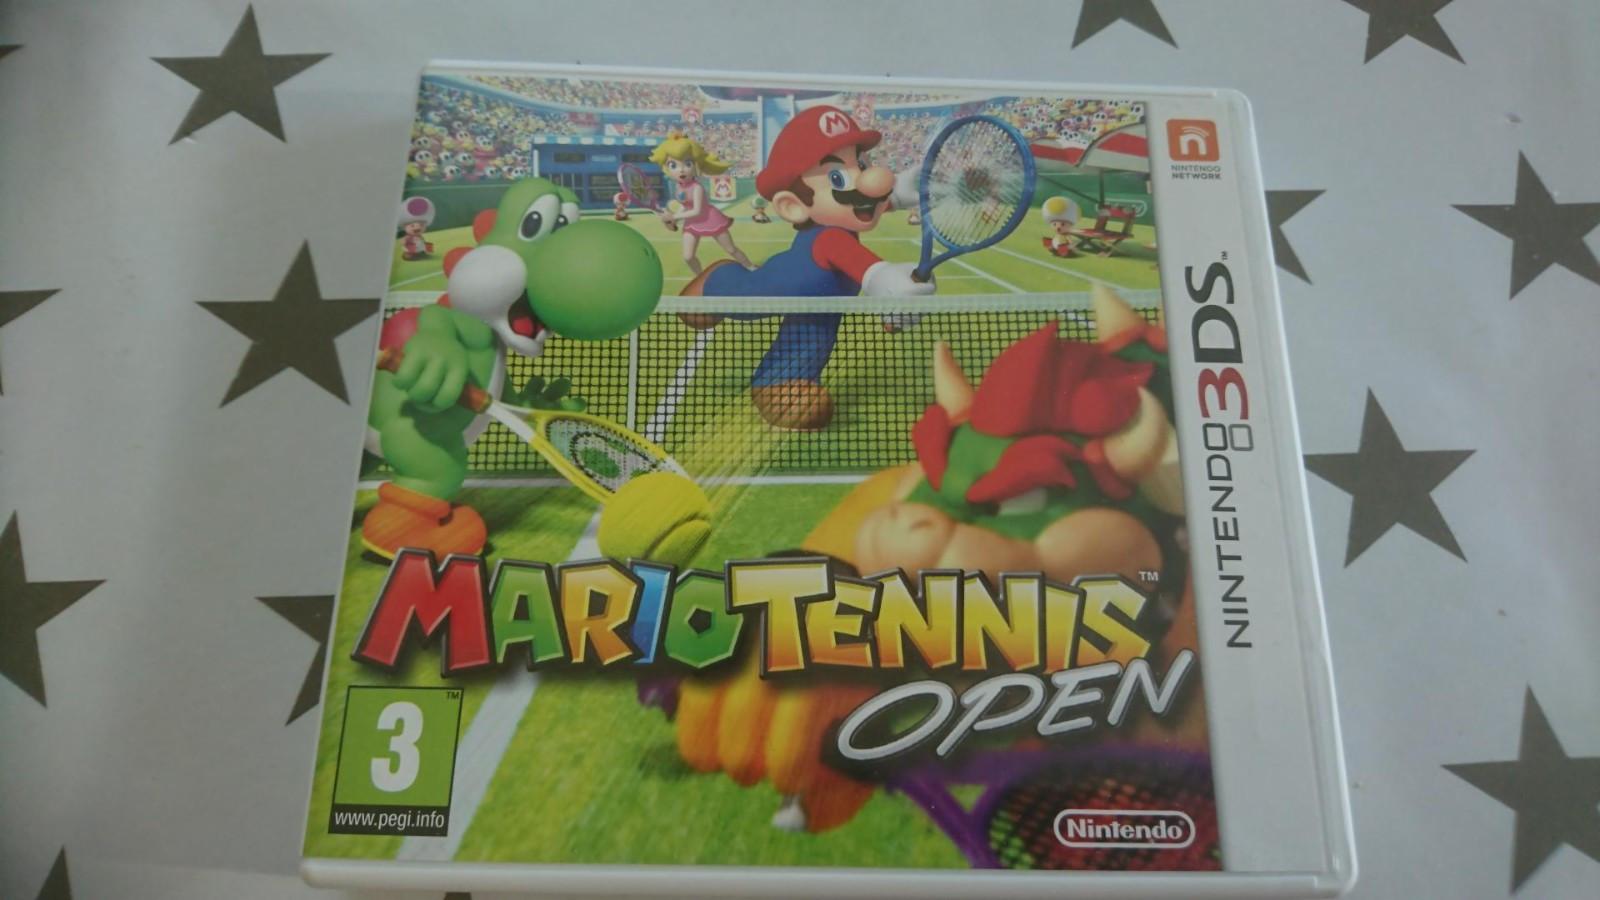 Nintendo 3DS - Hasselvika  - Nintendo 3DS spill selges. Mario Tennis open - Hasselvika